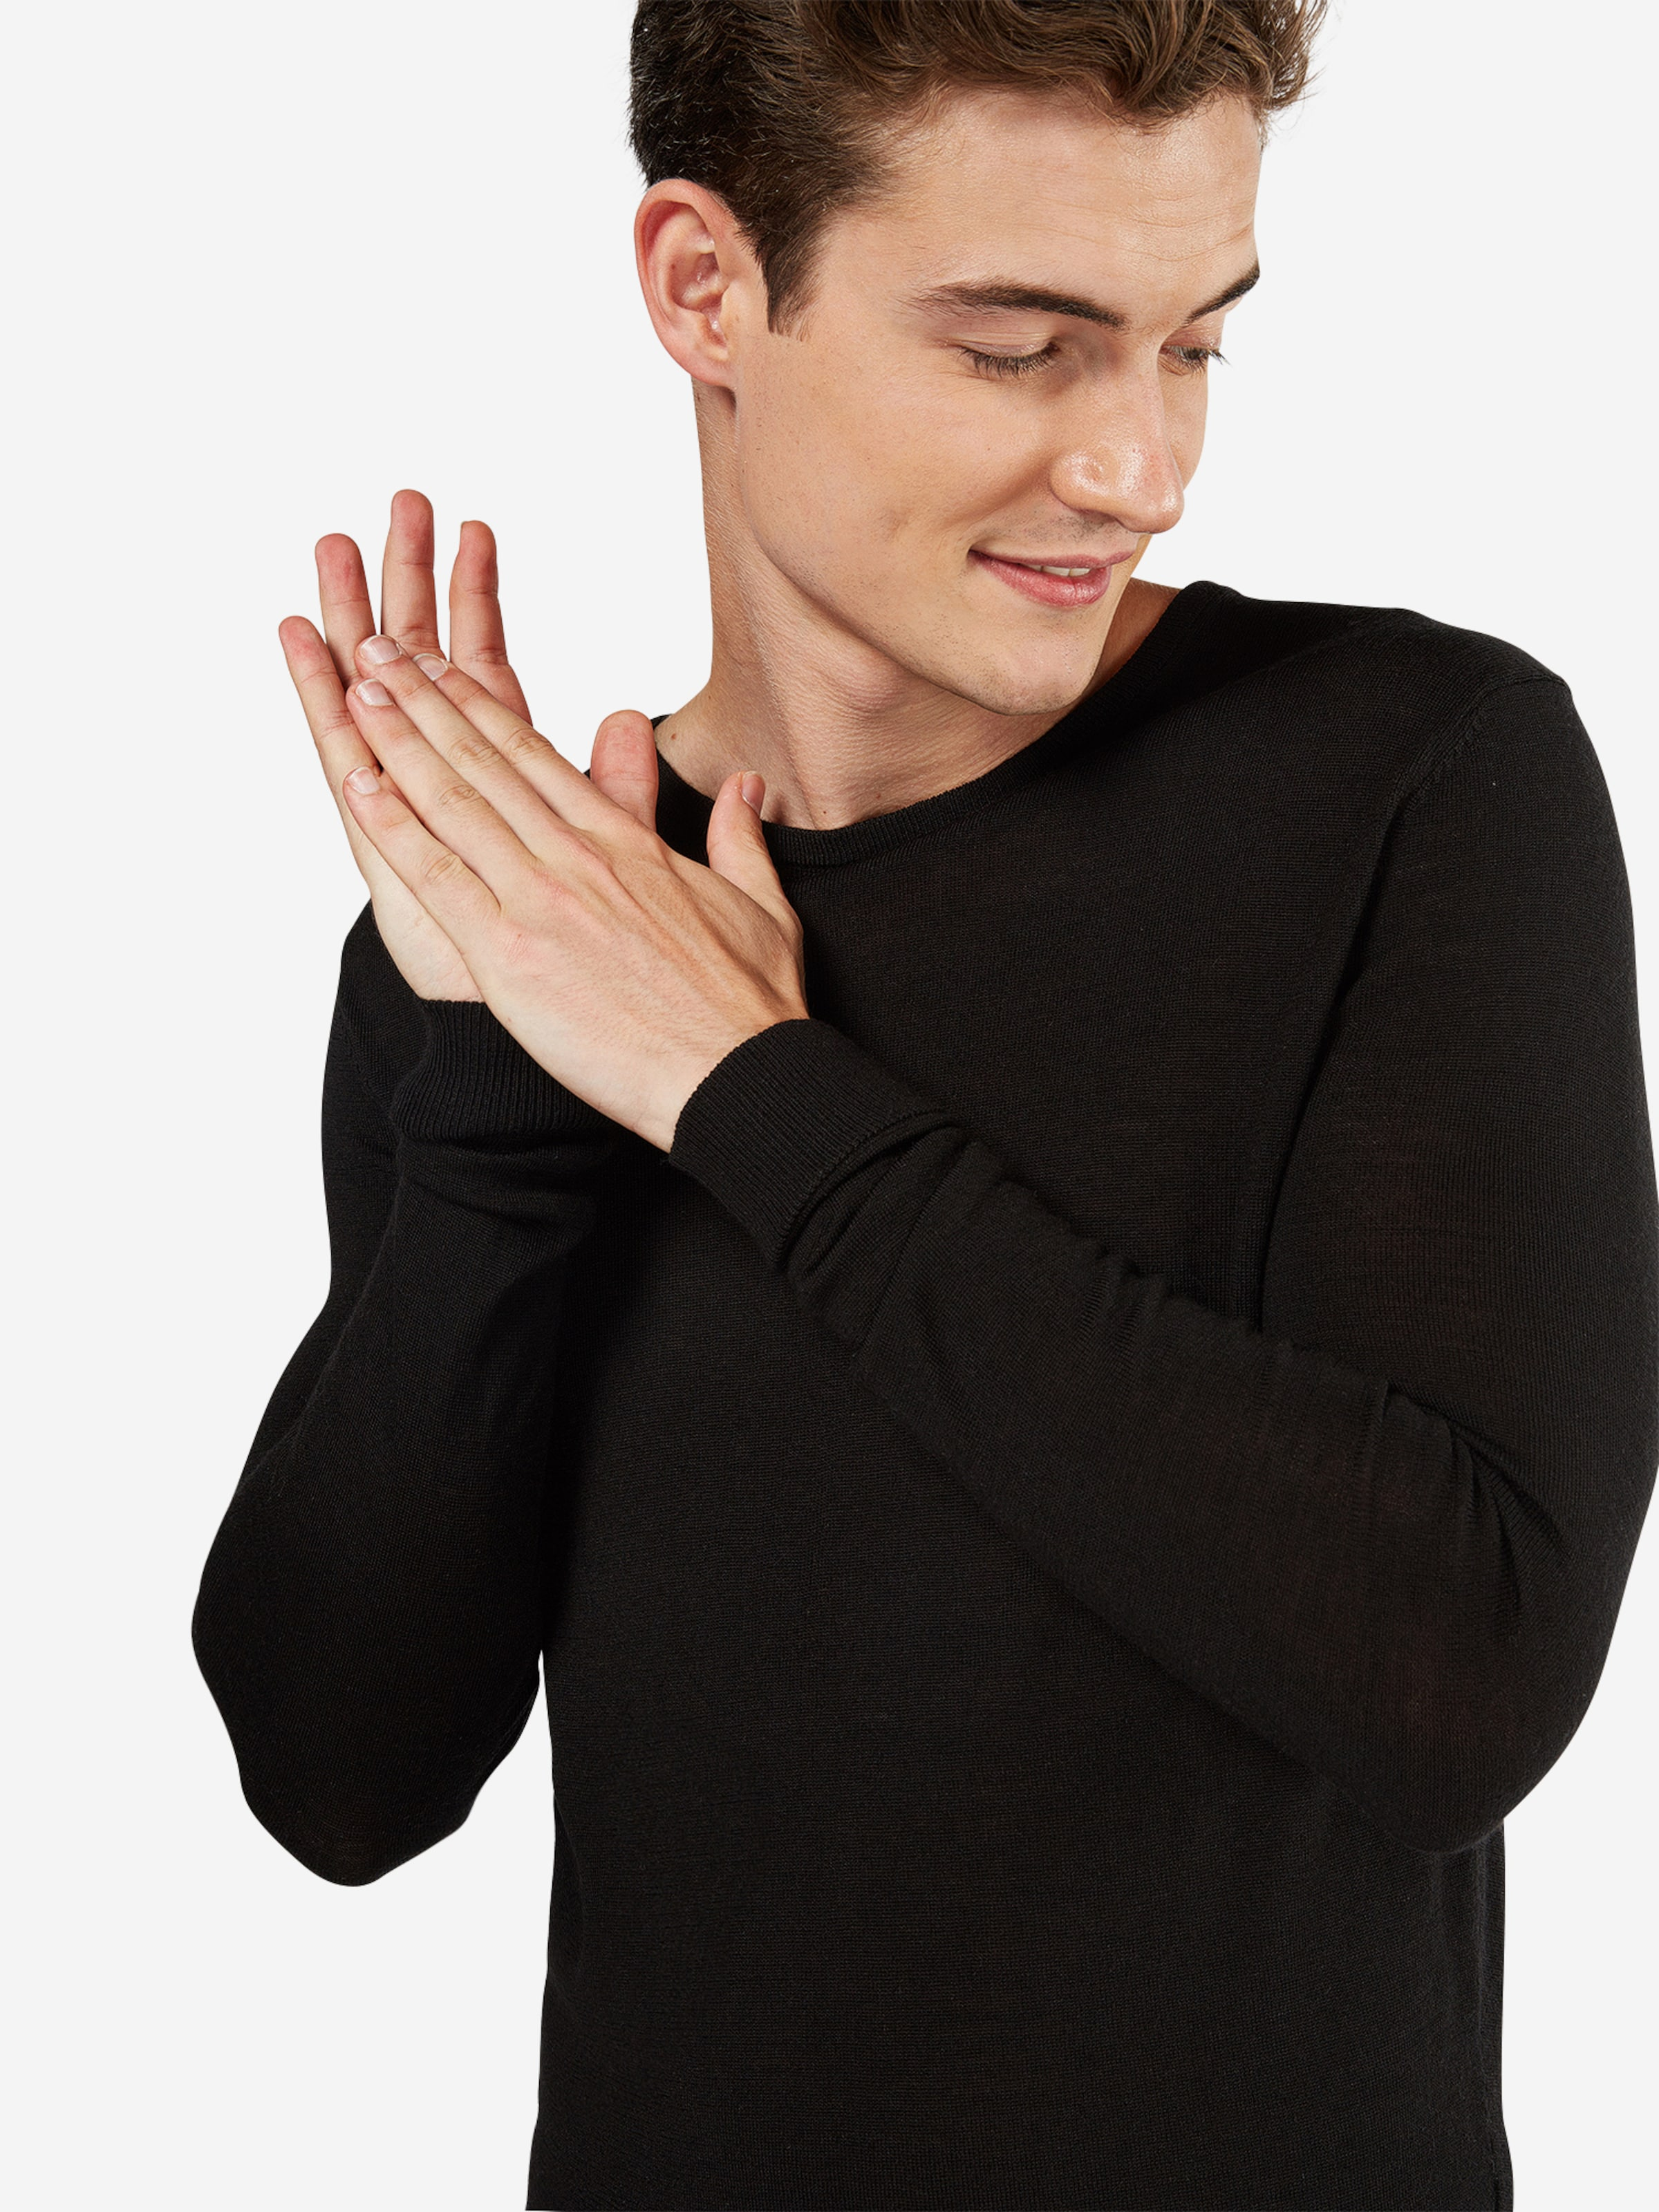 SELECTED HOMME Pullover 'SHDTOWER MERINO CREW NECK NOOS' Freies Verschiffen Exklusiv Bester Platz Rabatt Aaa Pay Online Mit Visa 2KKfG9ki1